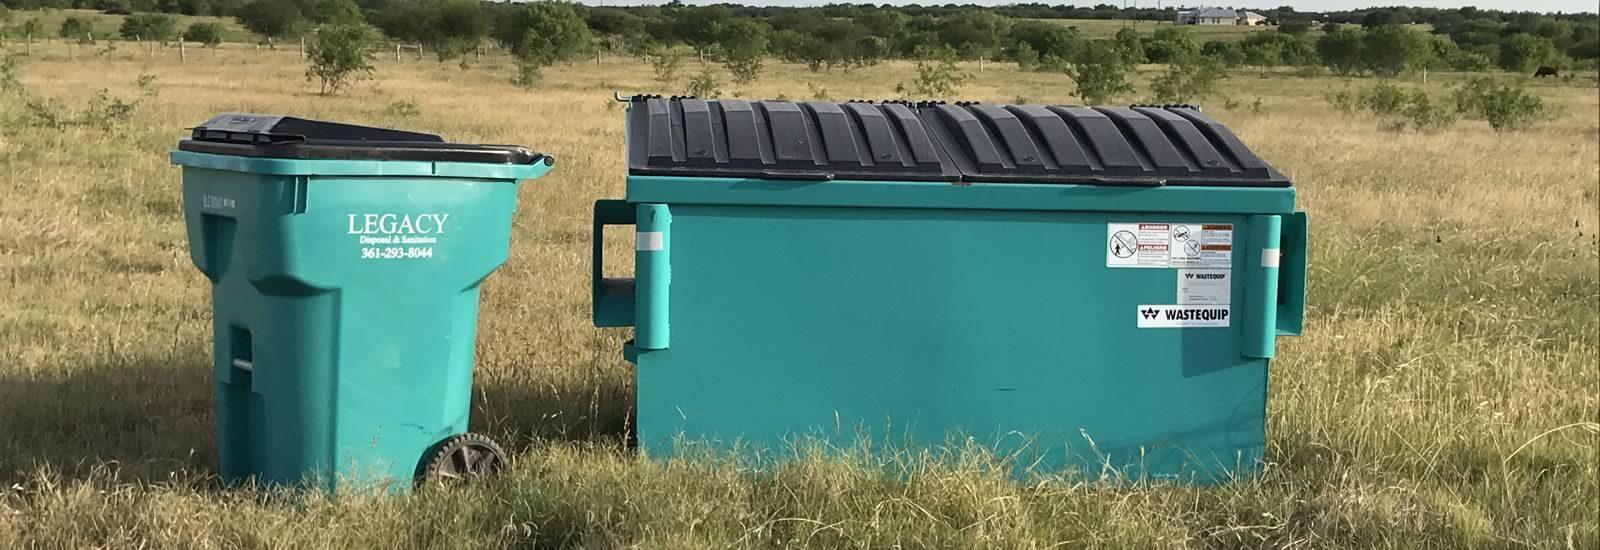 Legacy Disposal & Sanitation : Portable Toilets, Dumpsters ...